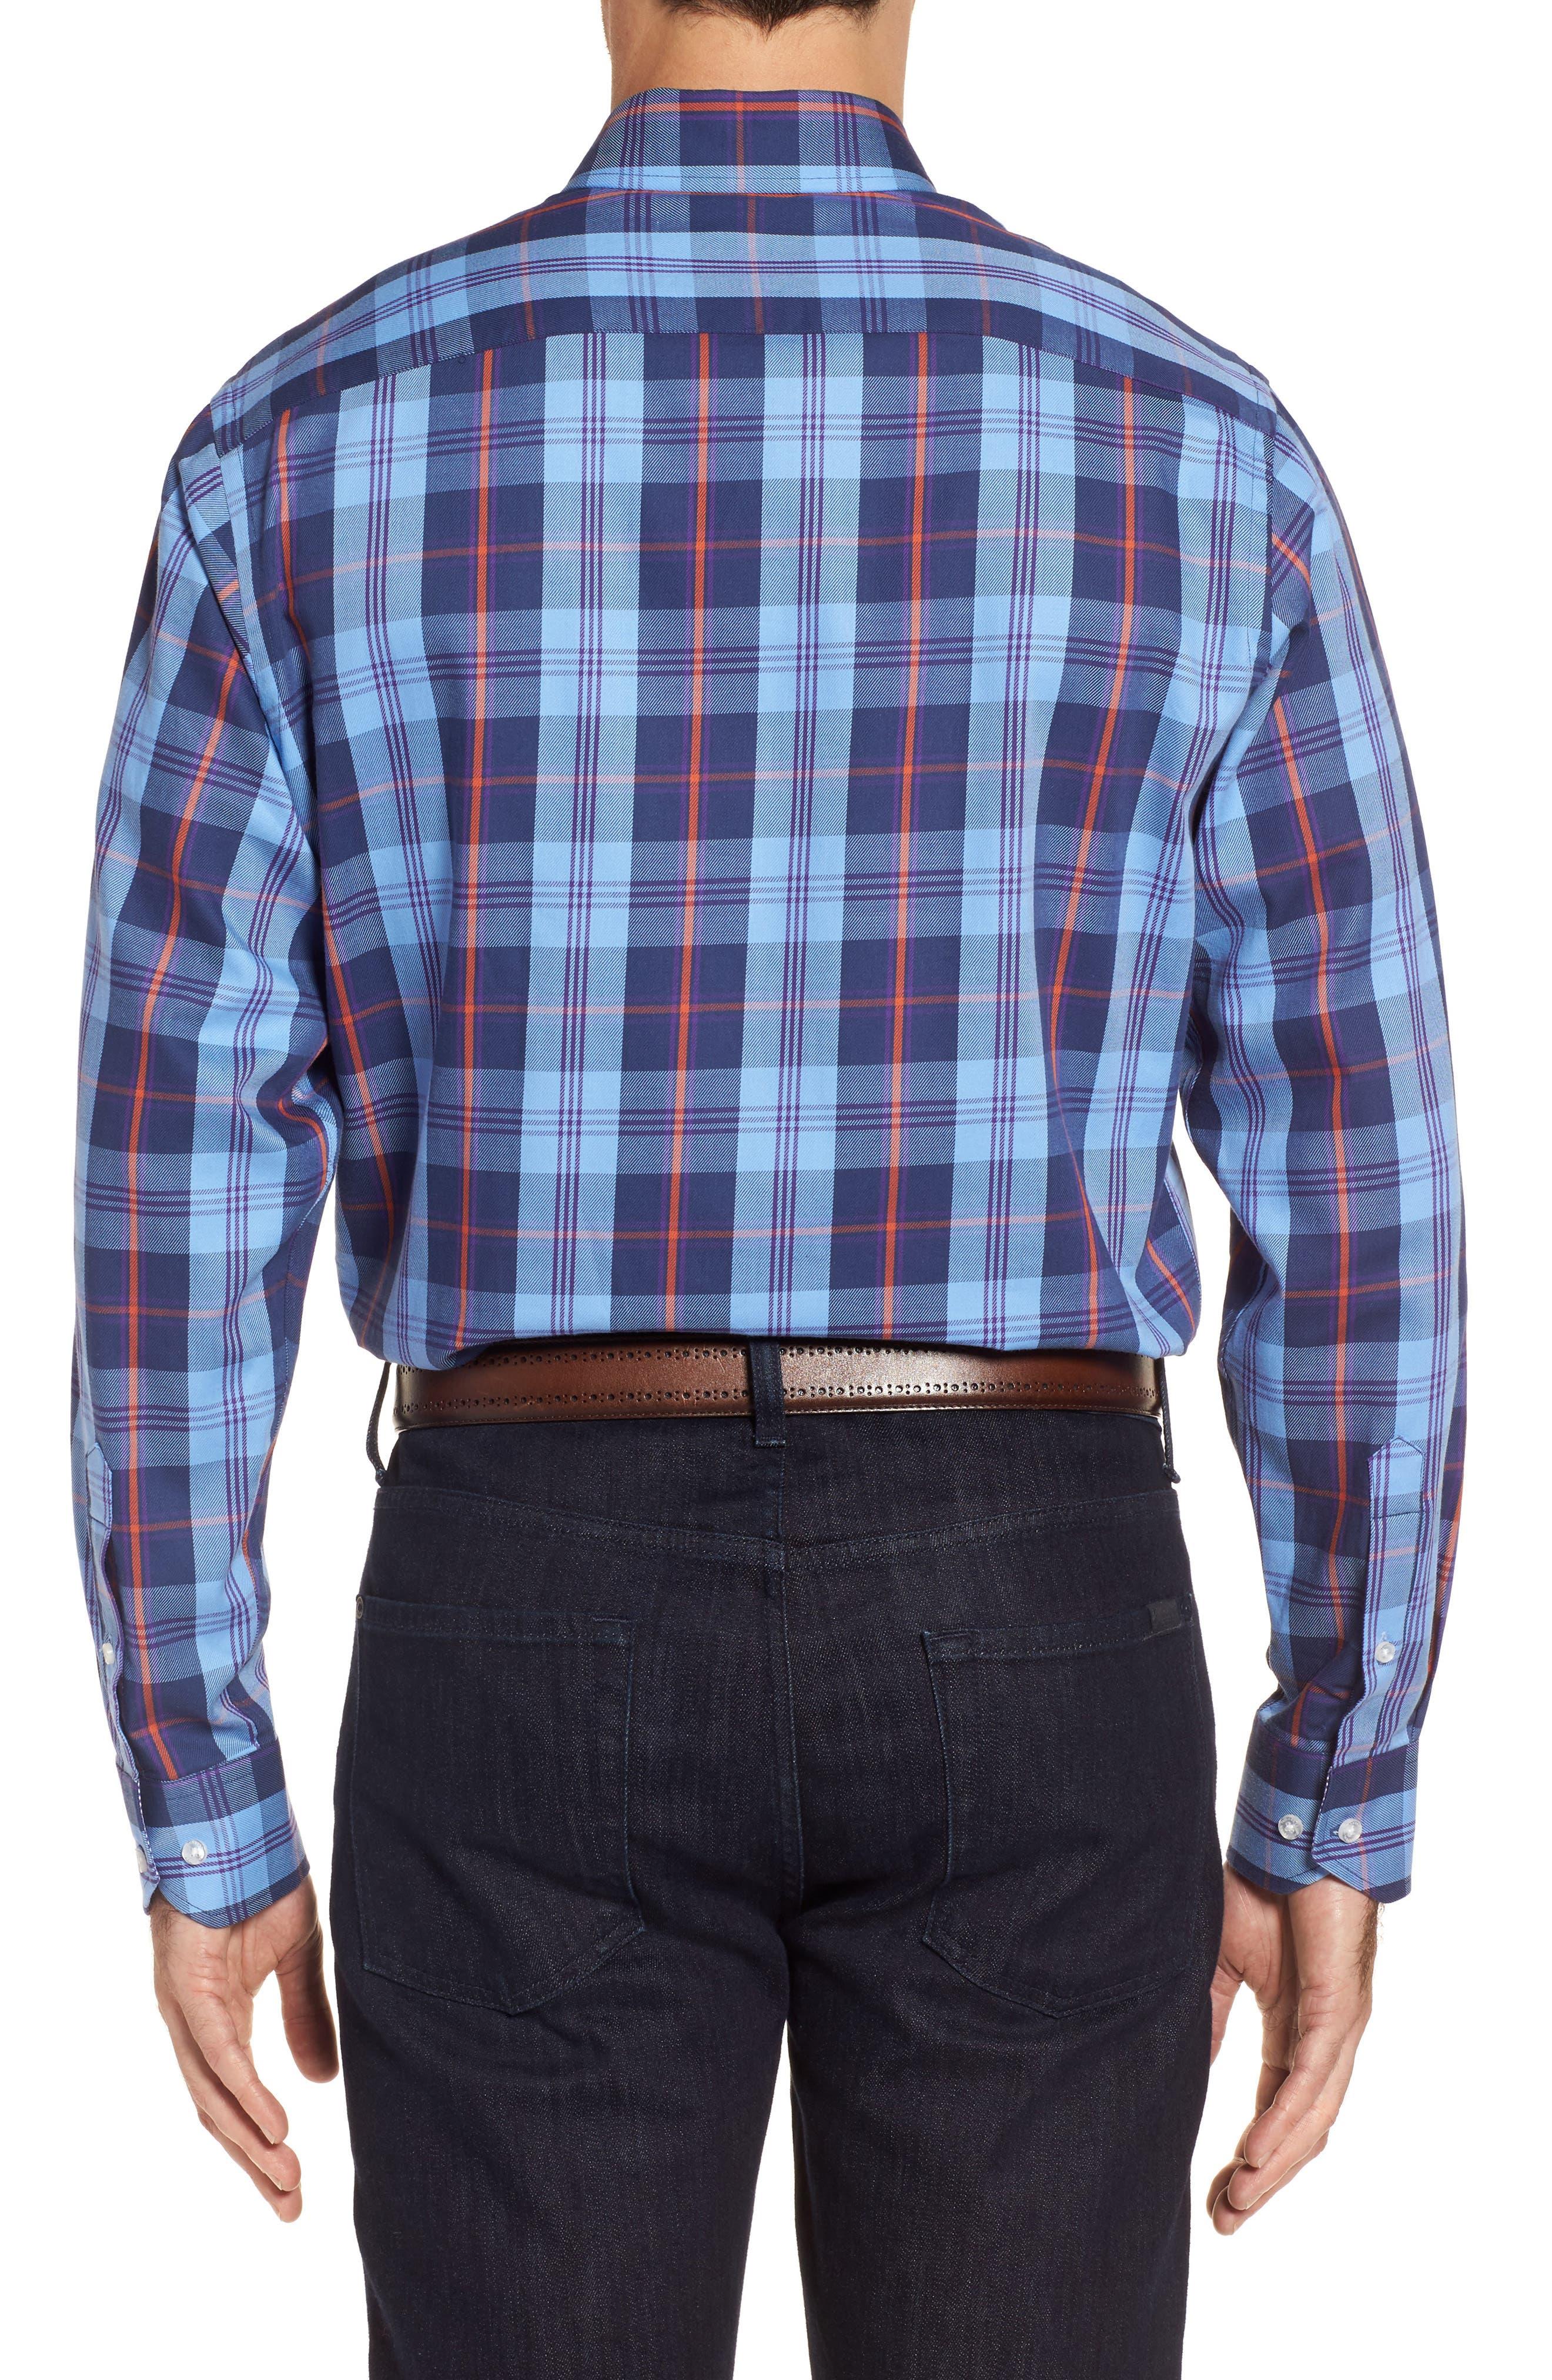 Chauvin Regular Fit Plaid Sport Shirt,                             Alternate thumbnail 2, color,                             Navy